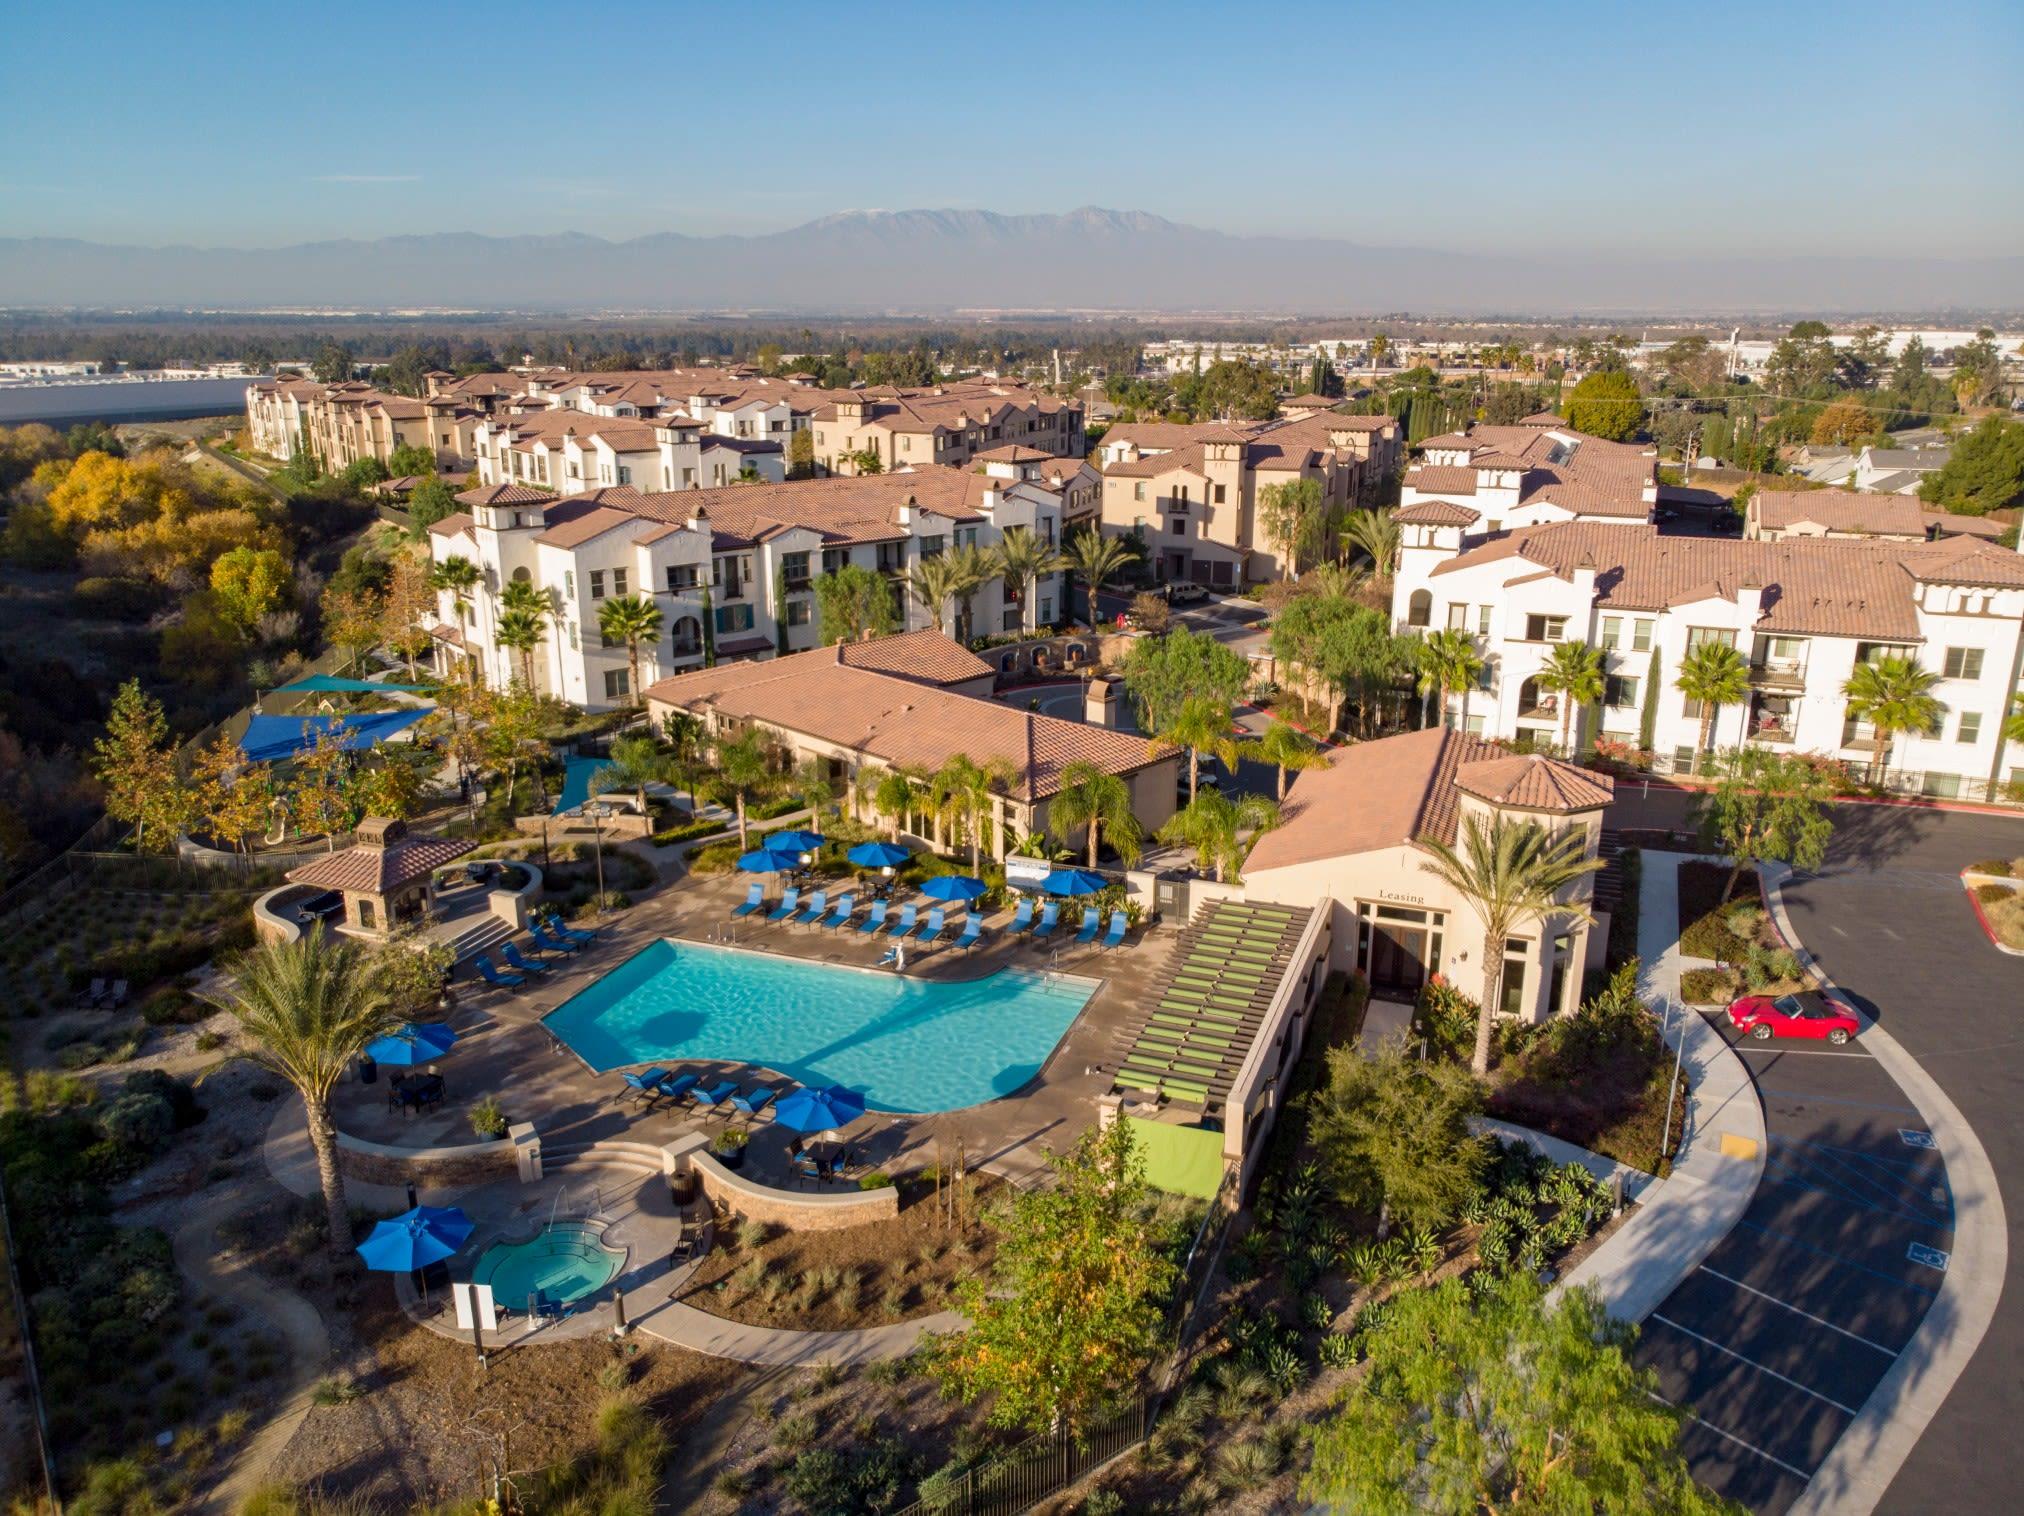 An aerial view of Palisades Sierra Del Oro, showcasing it's luxury resort-inspired community amenities.